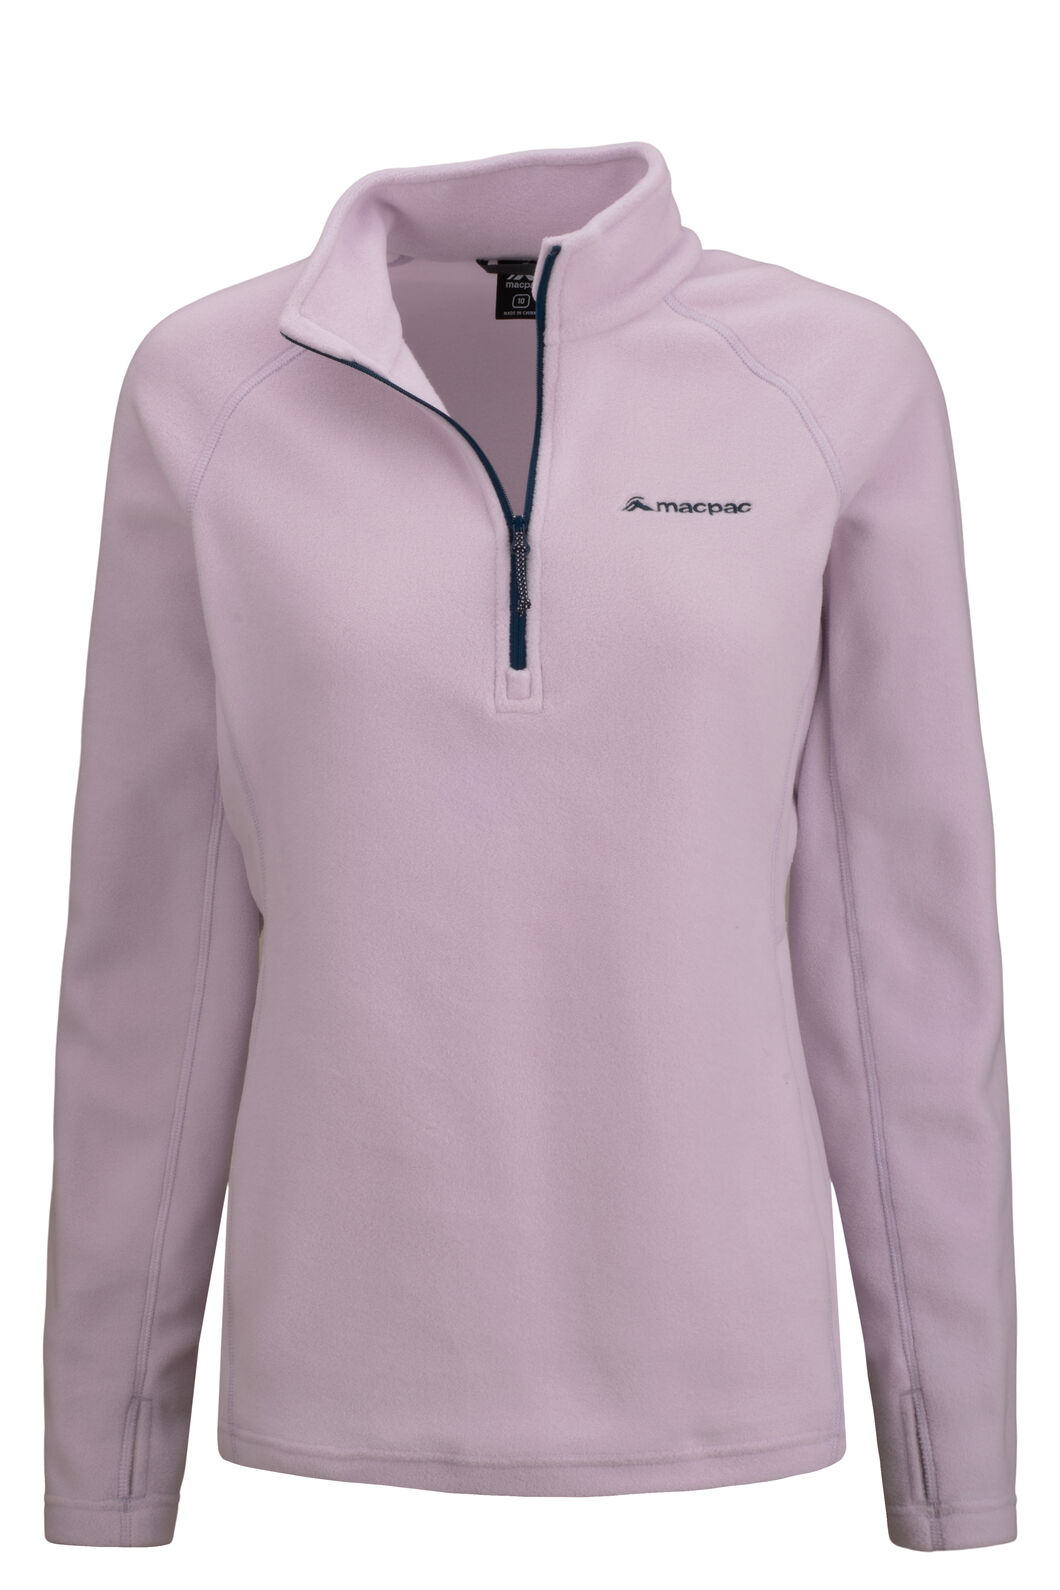 Macpac Tui Polartec® Micro Fleece® Pullover — Women's, Orchid Hush, hi-res